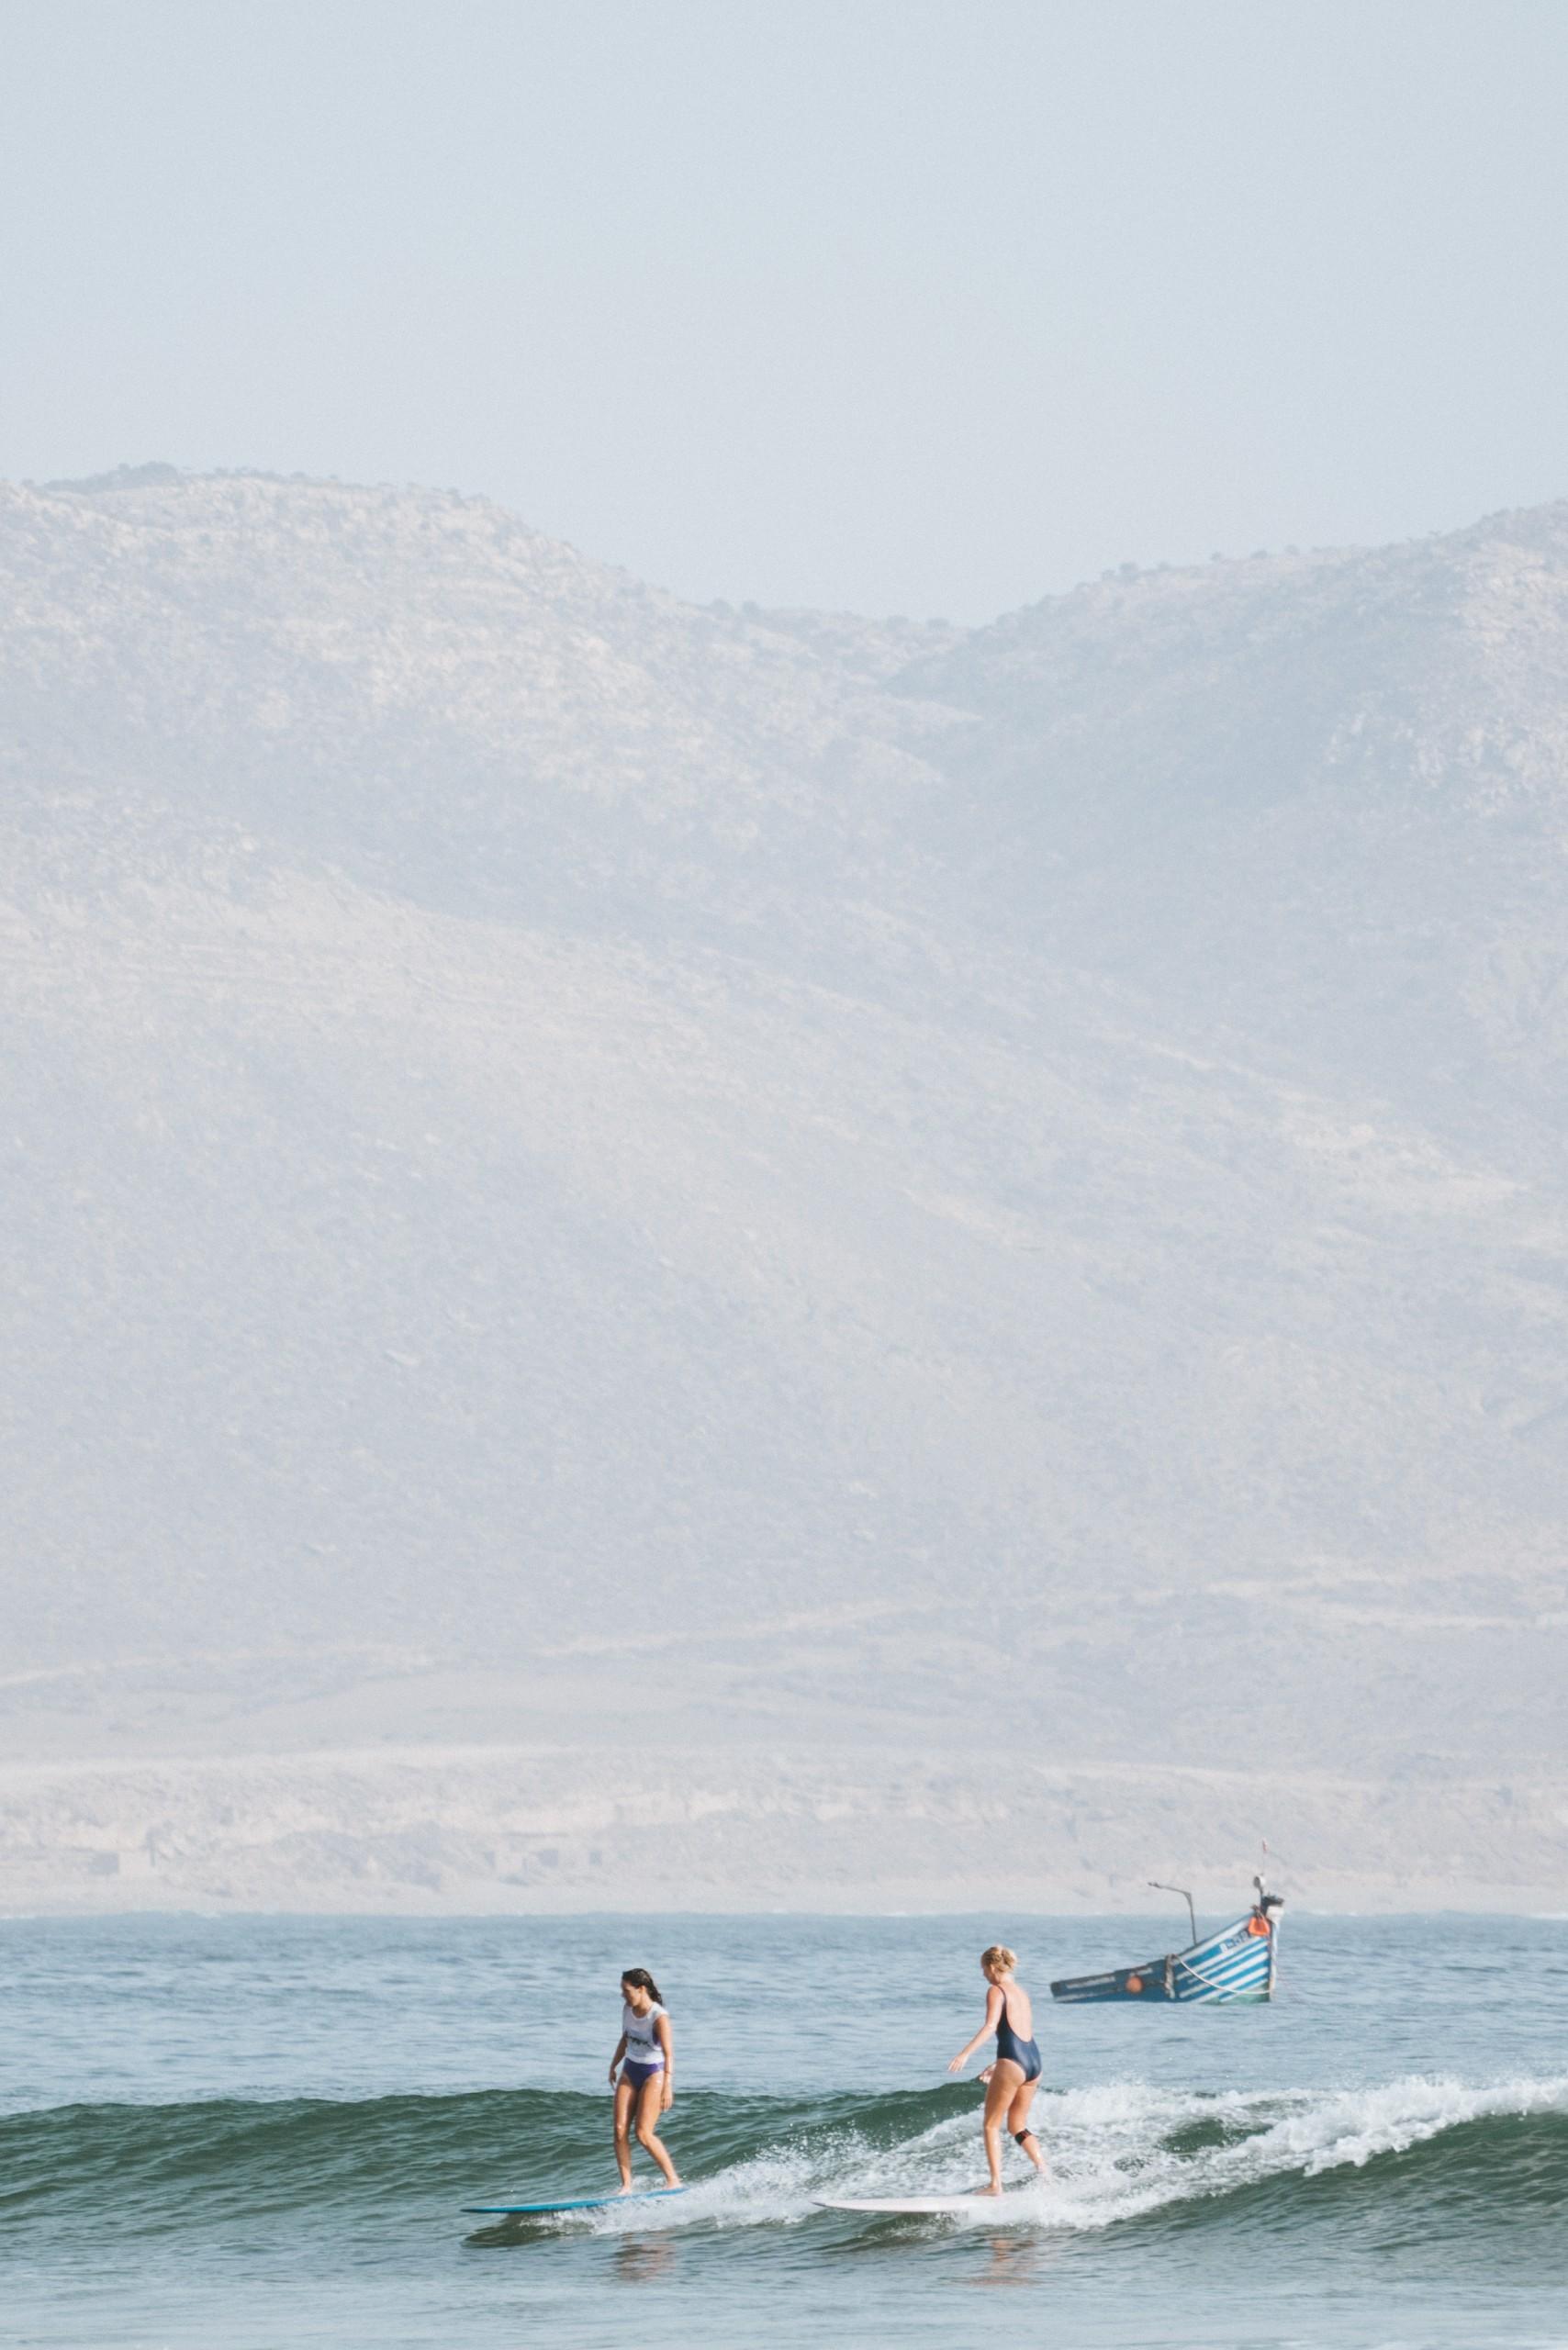 Imsouane longbaord surf maroc summer